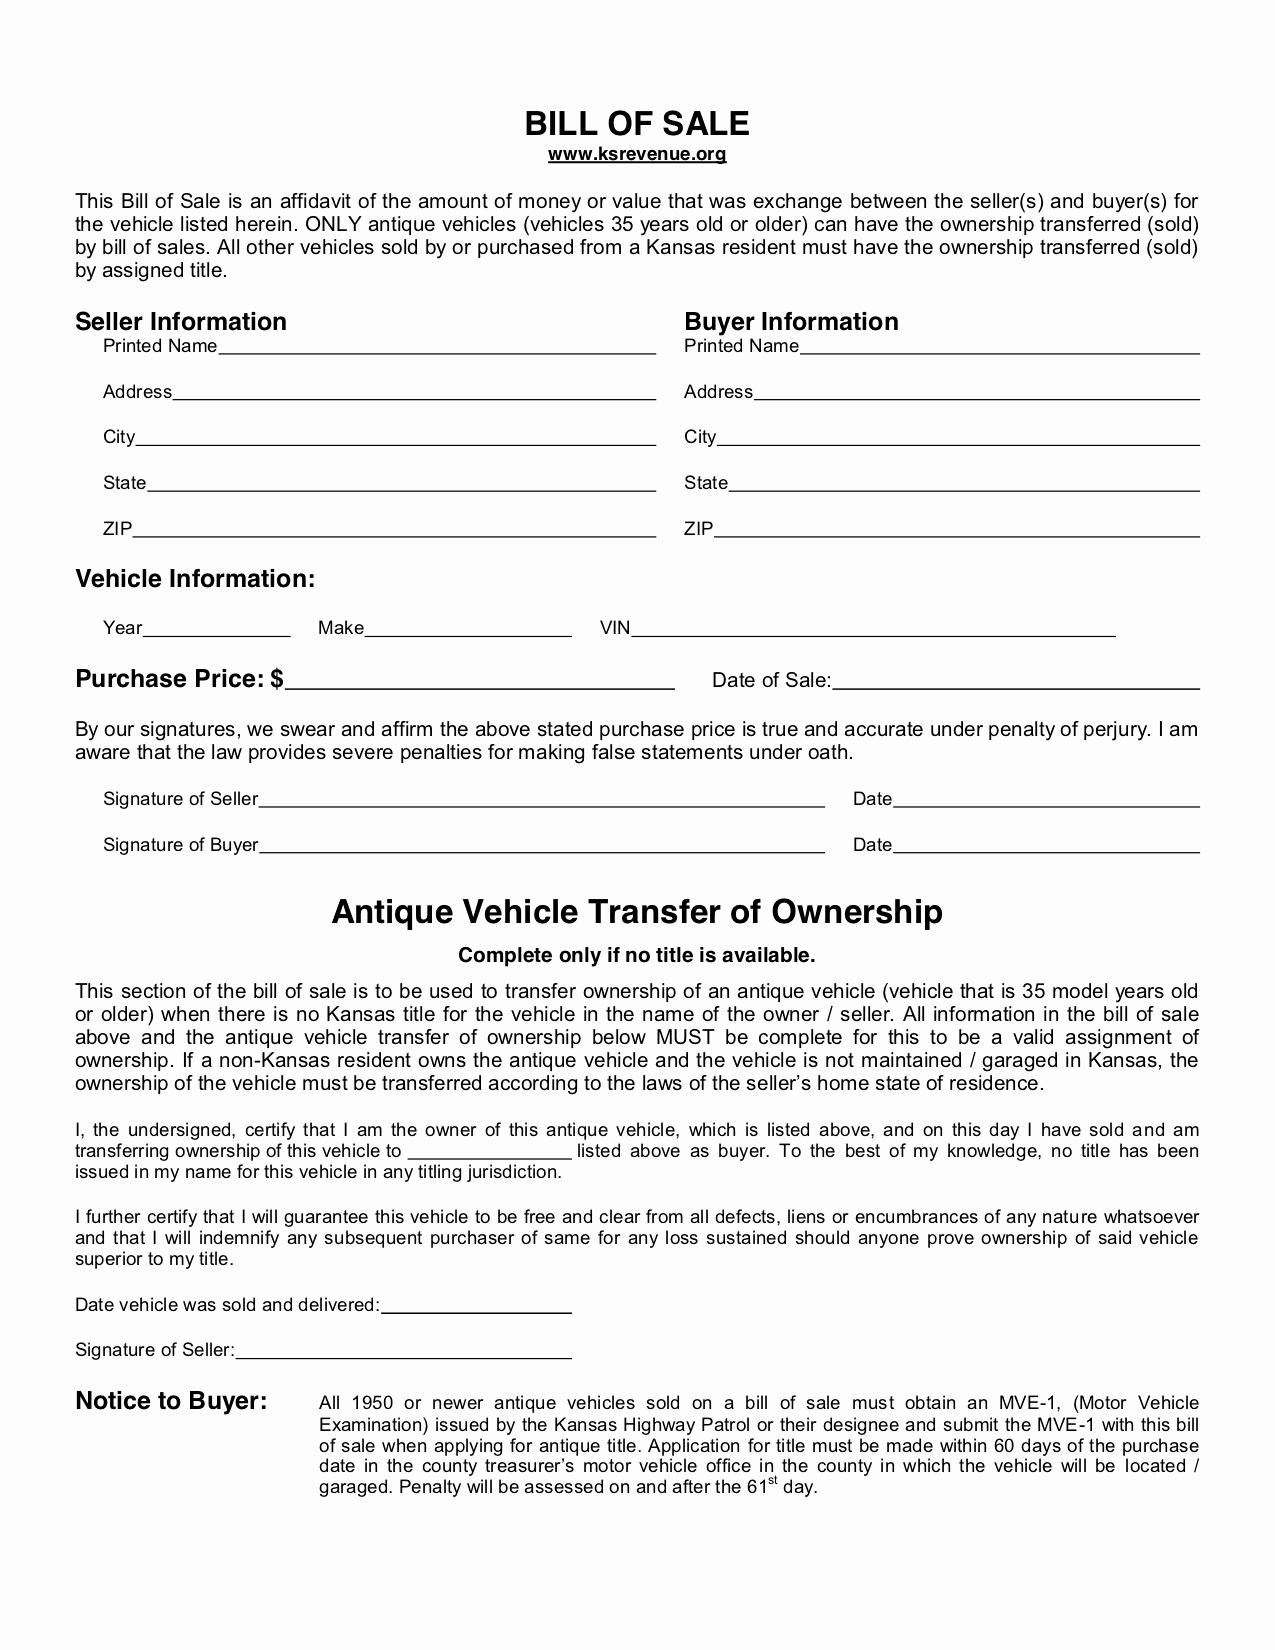 Free Template Bill Of Sale Fresh Free Kansas Bill Of Sale form Pdf Template